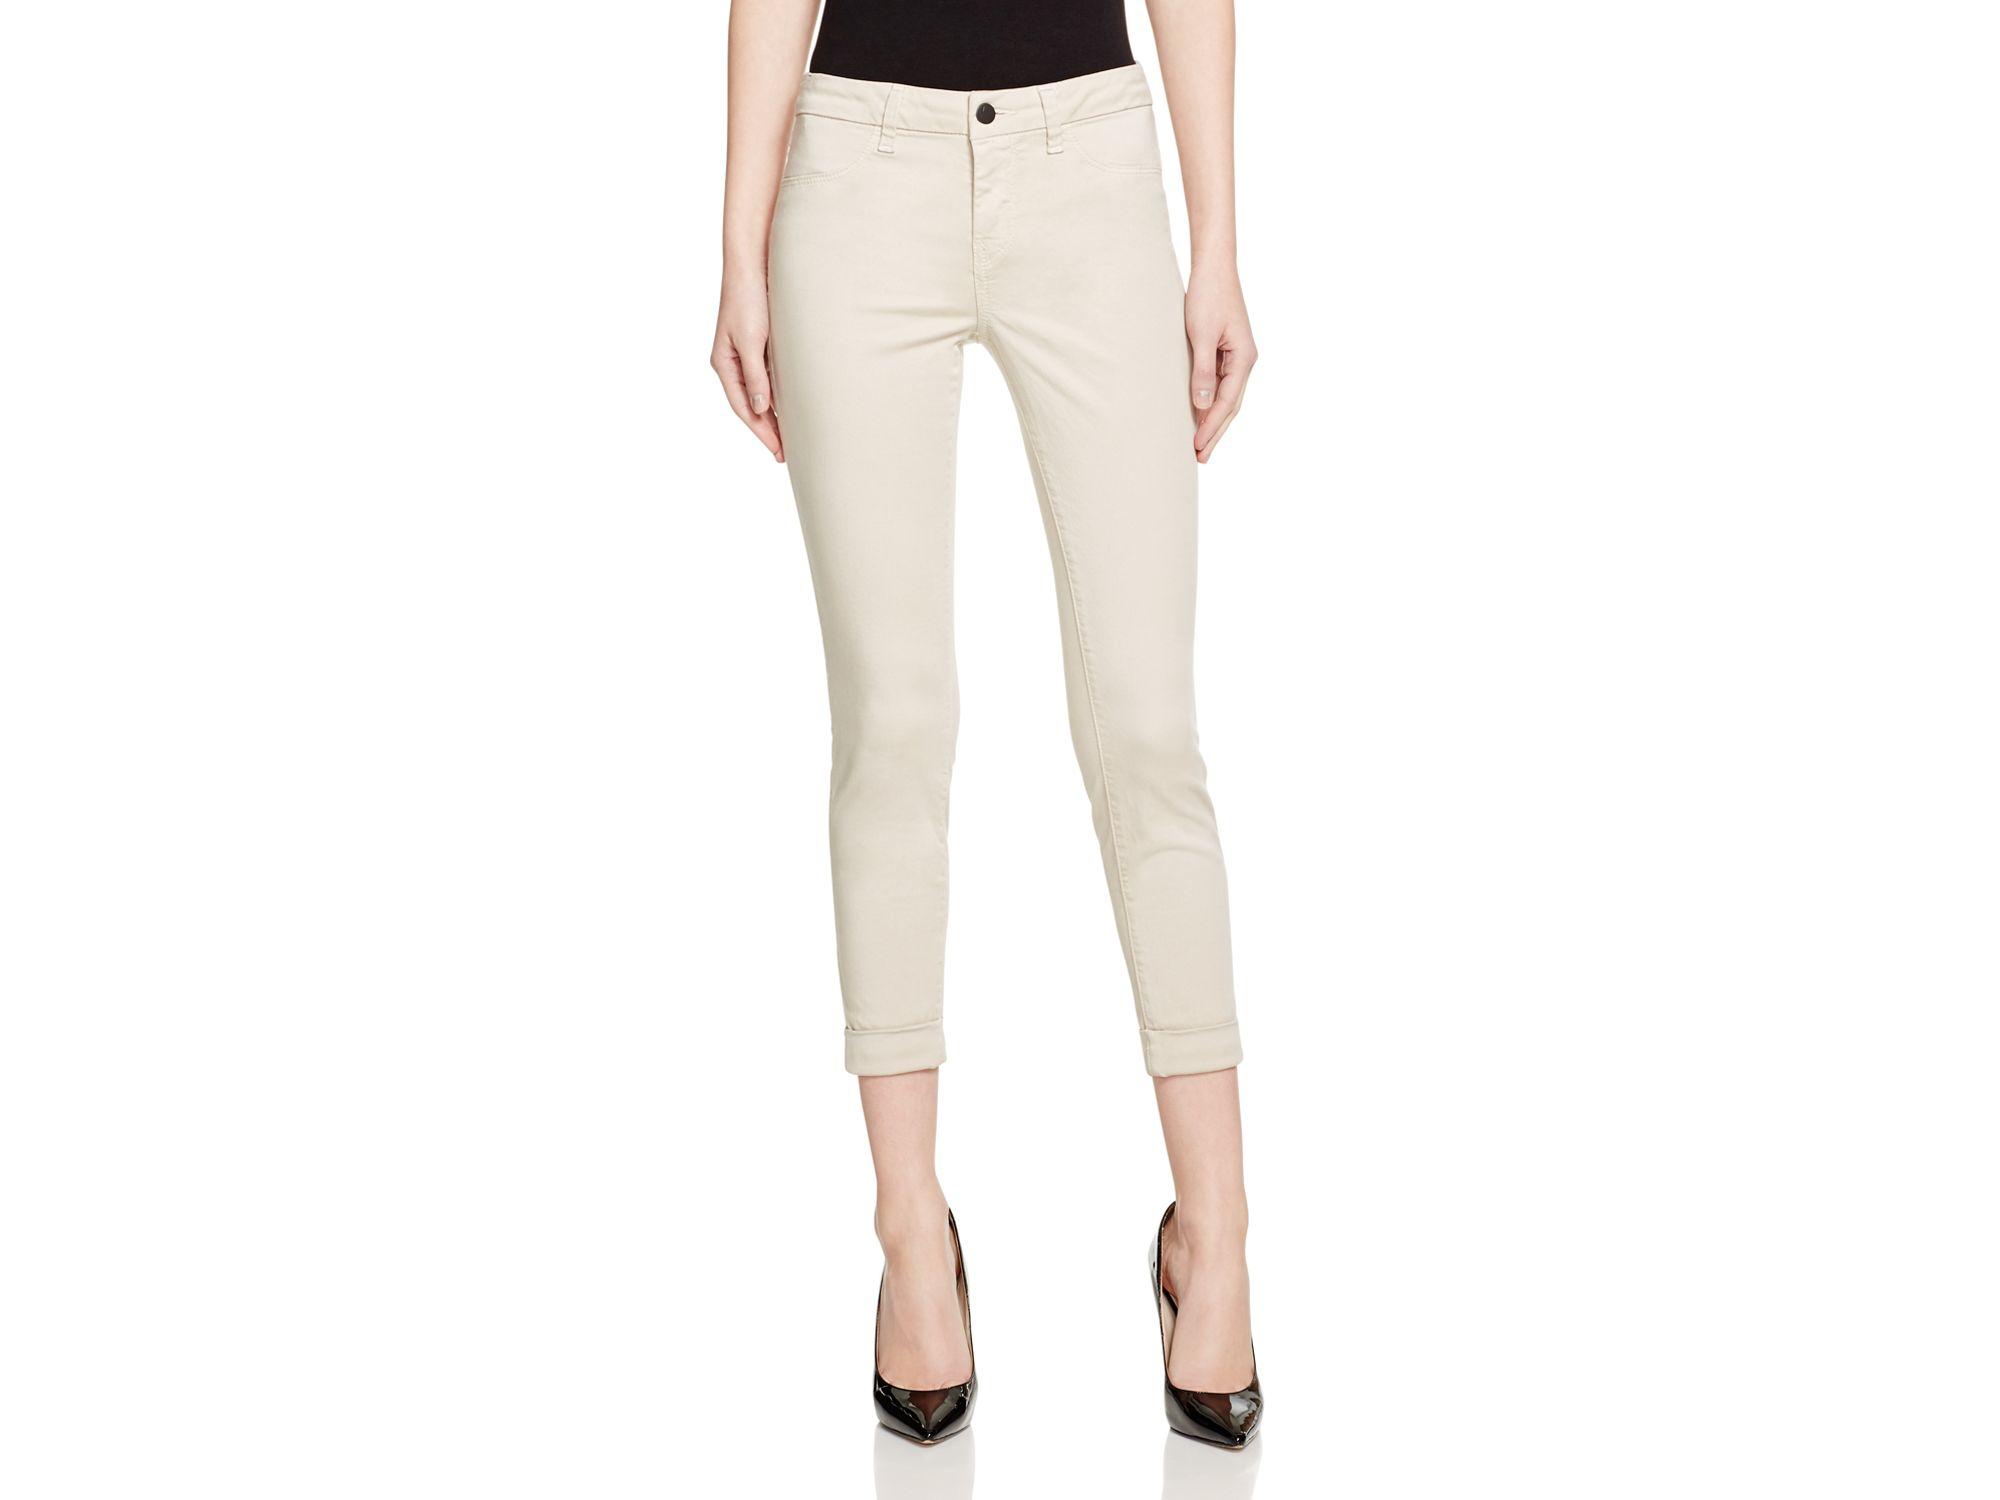 b22ec84e070 Lyst - J Brand Anja Ankle Cuff Jeans In Ashwood in White